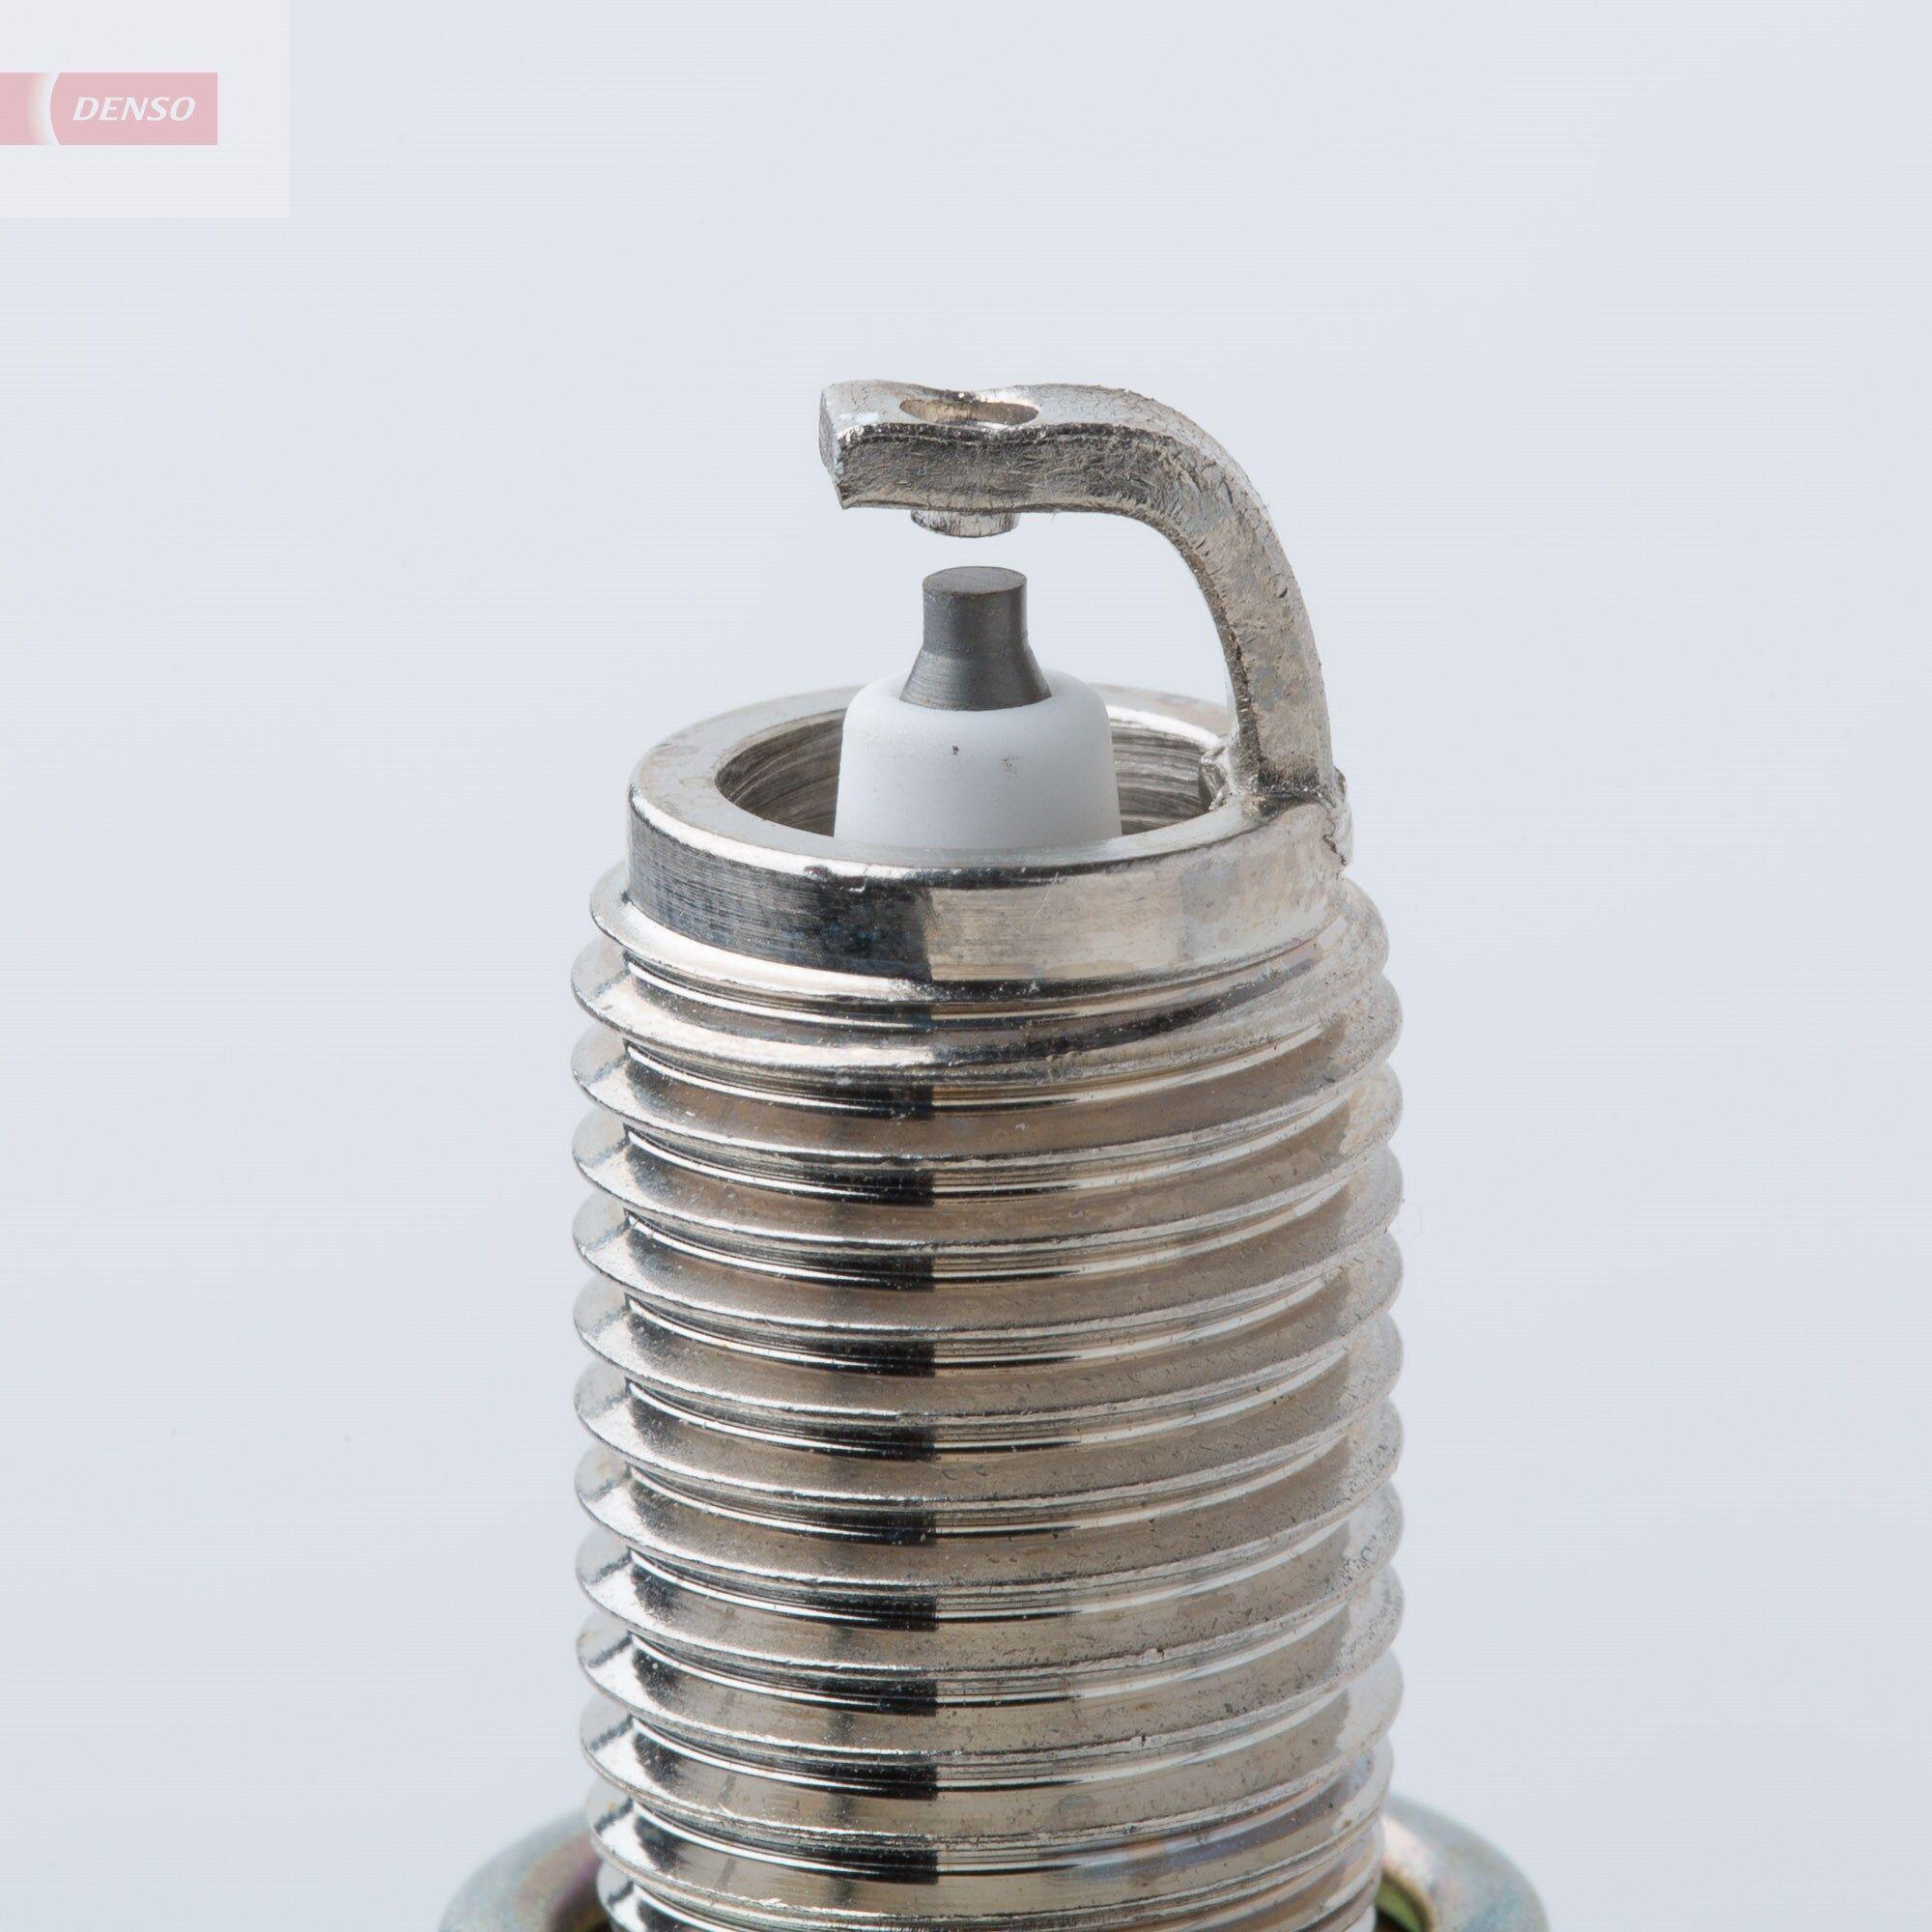 XU22TT Spark Plug DENSO 4614 - Huge selection — heavily reduced